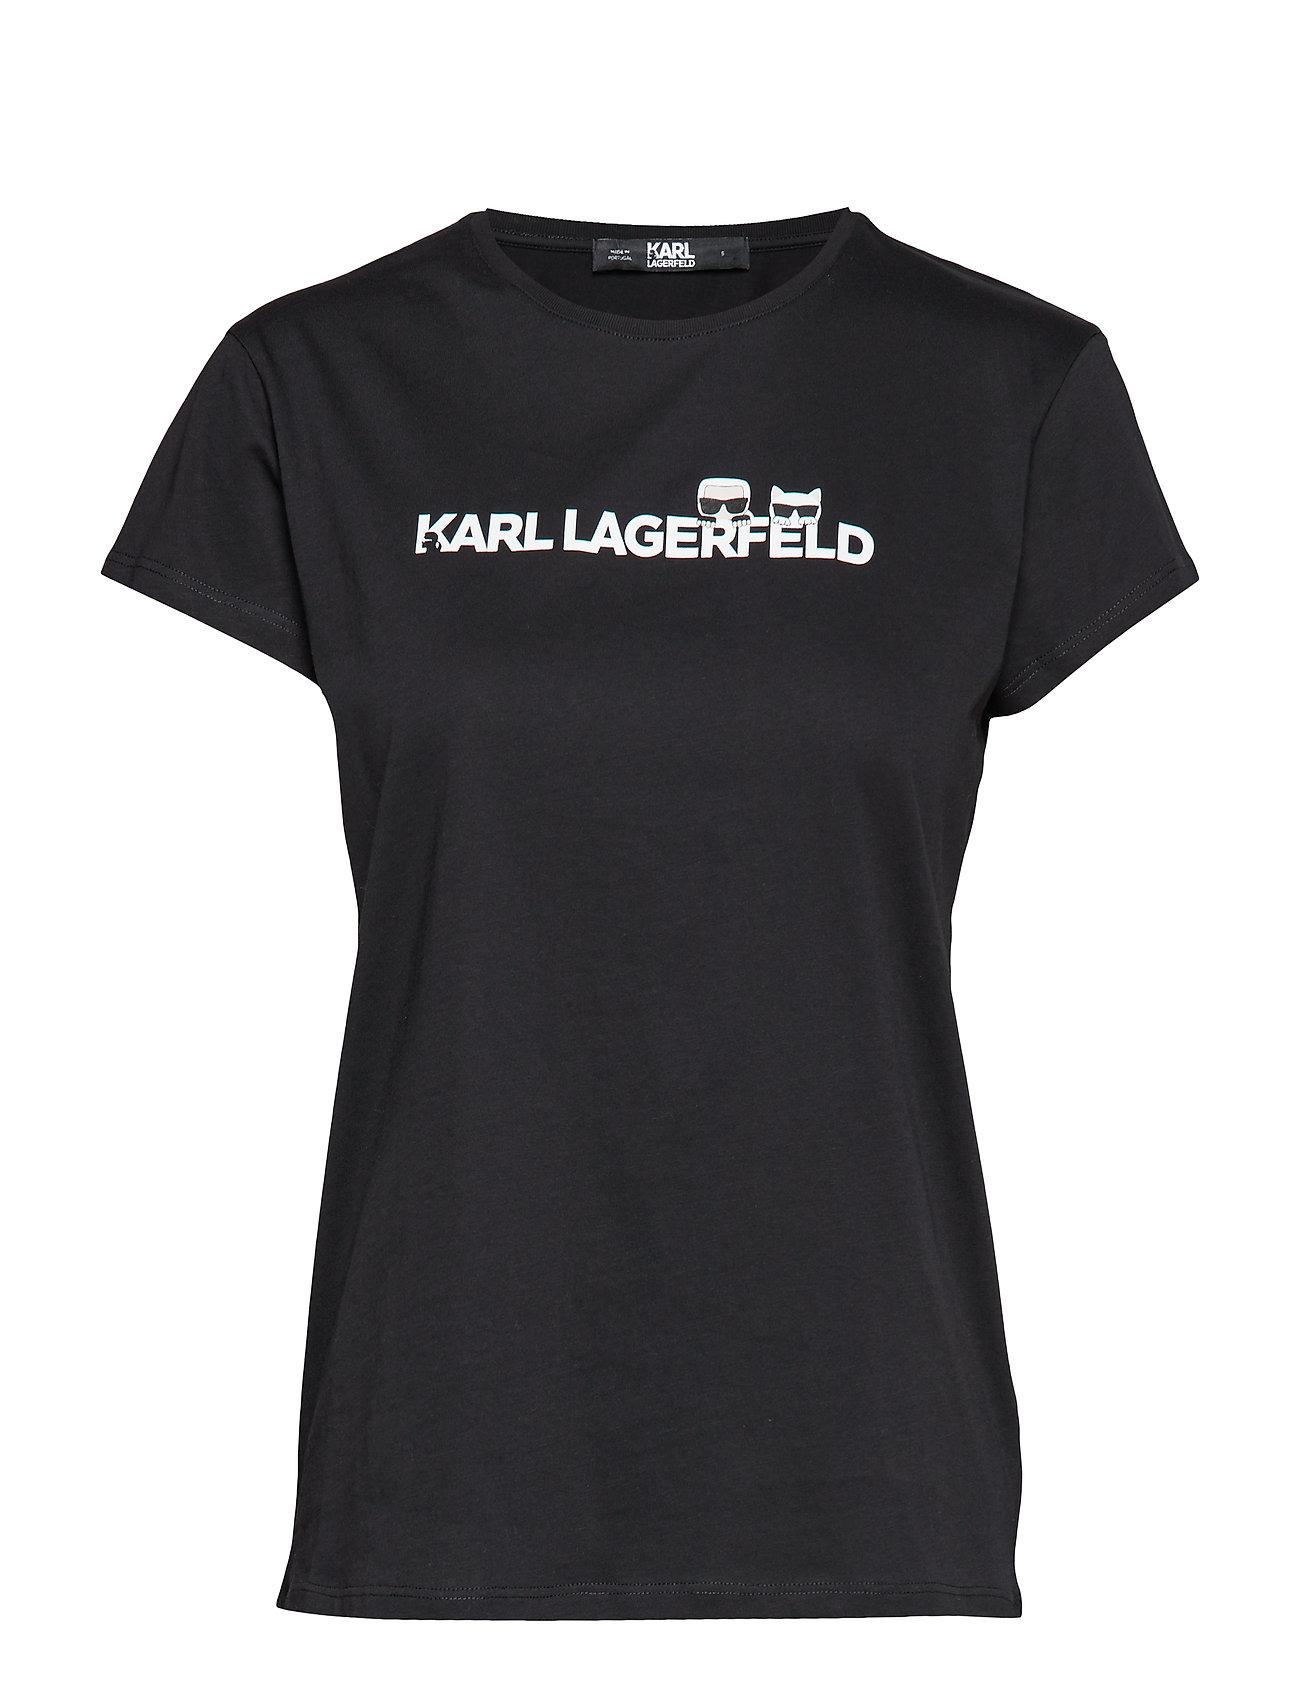 Karl Lagerfeld Ikonik & Logo T Shirt Ögrönlar